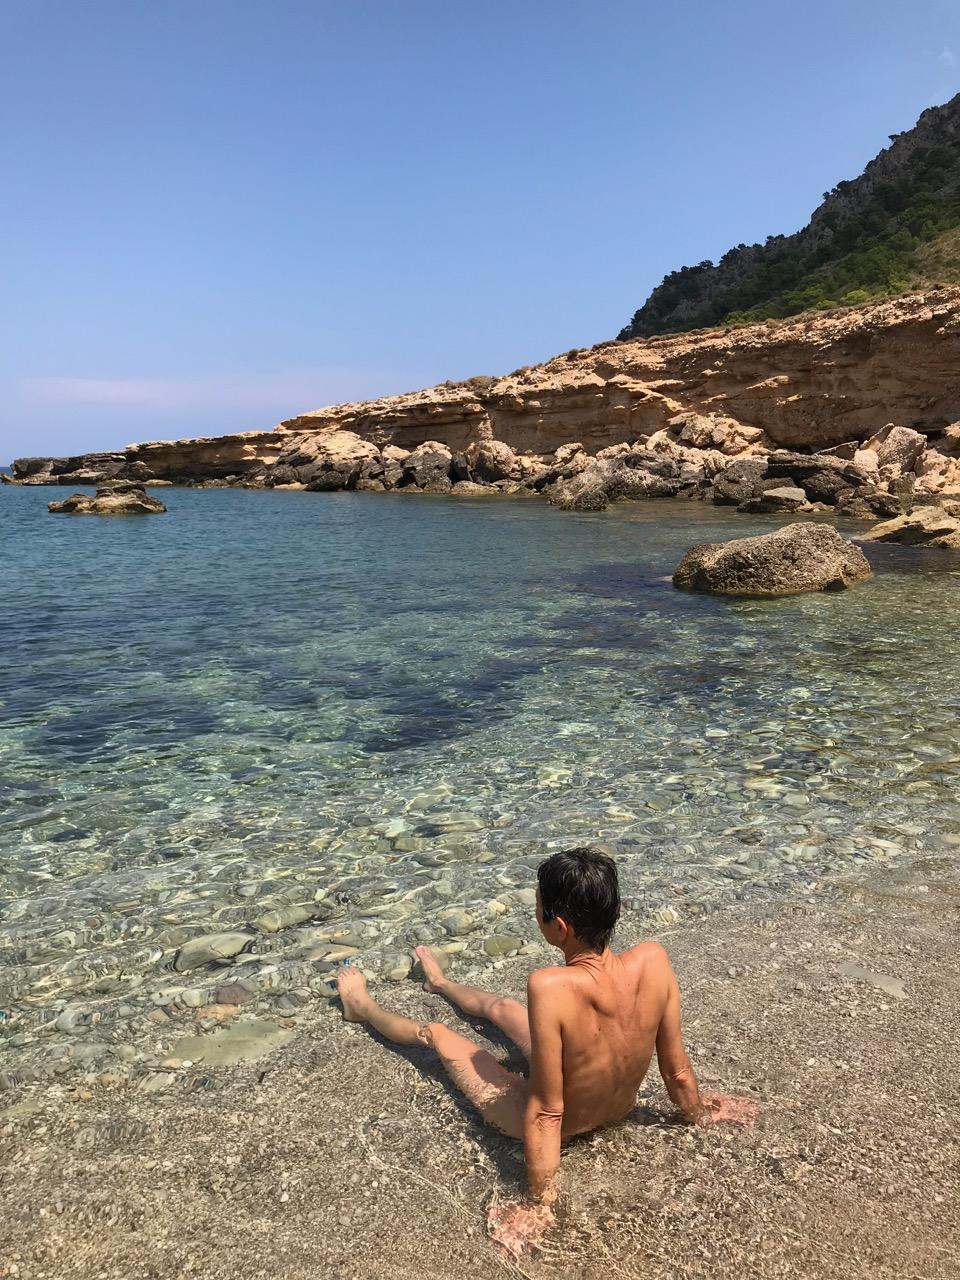 GALLERY: Nakations on Mallorca